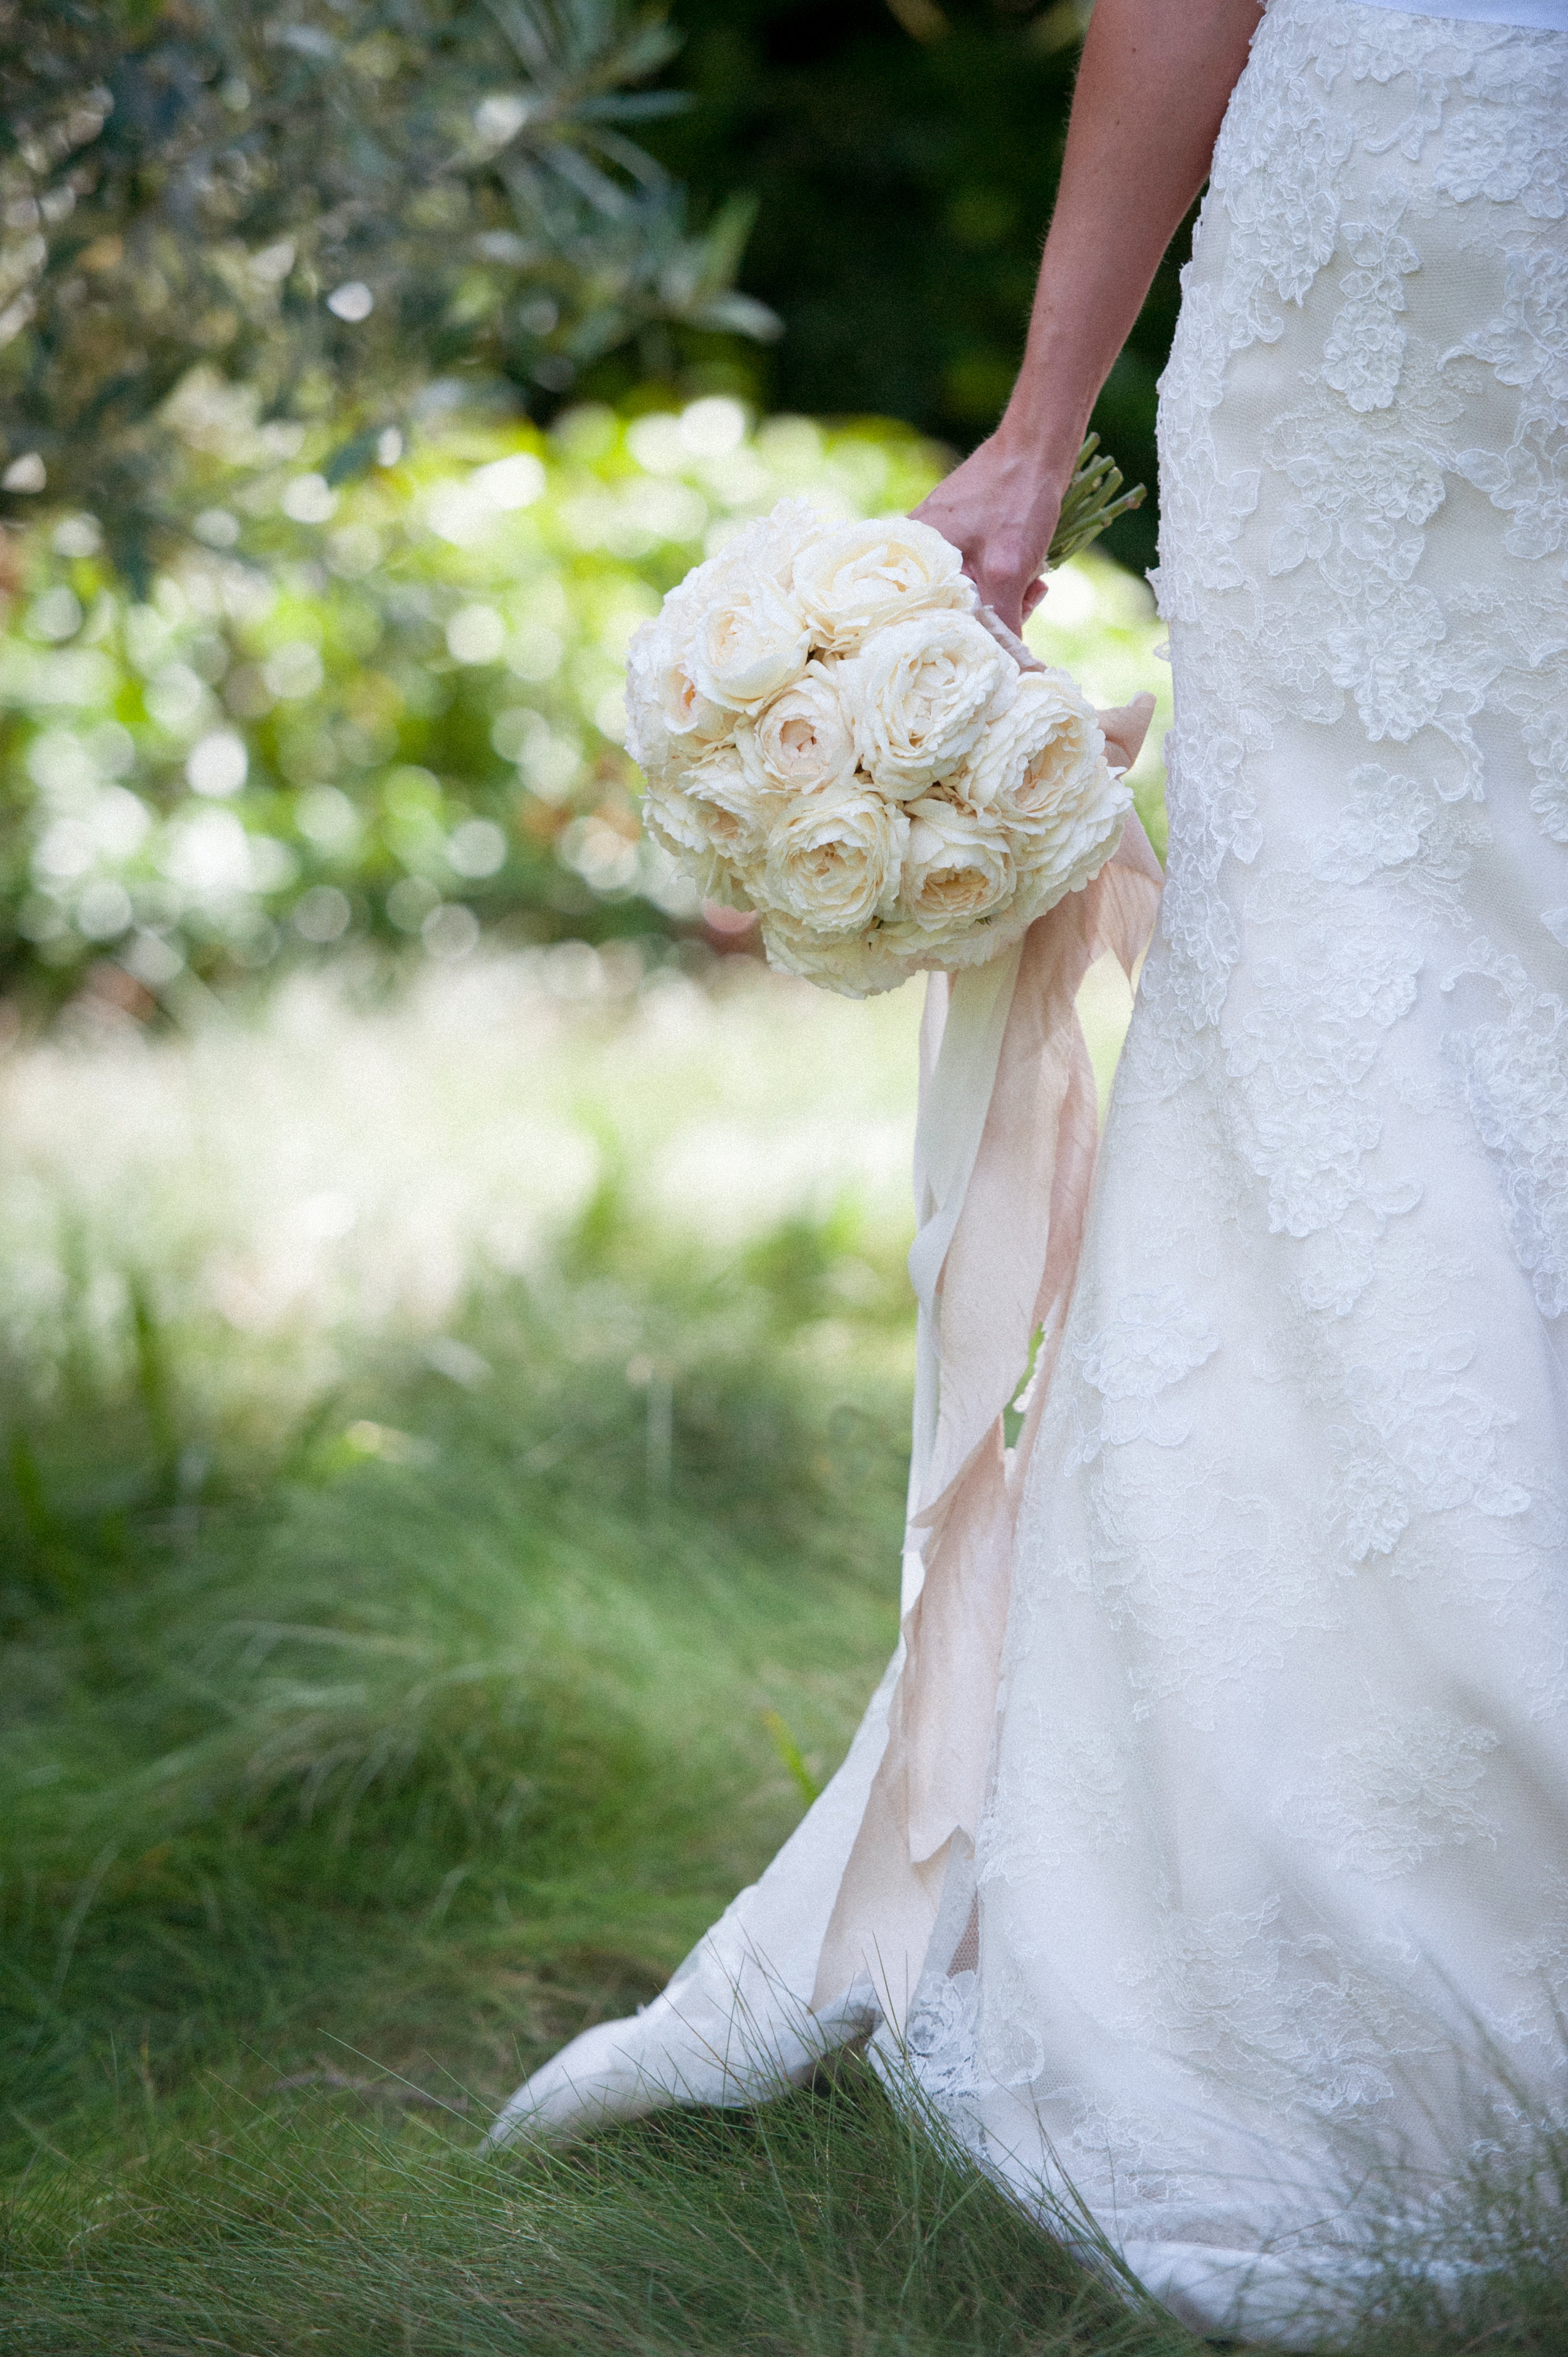 santabarbarawedding.com | Photo: Yvette Roman | Elegant white estate garden wedding